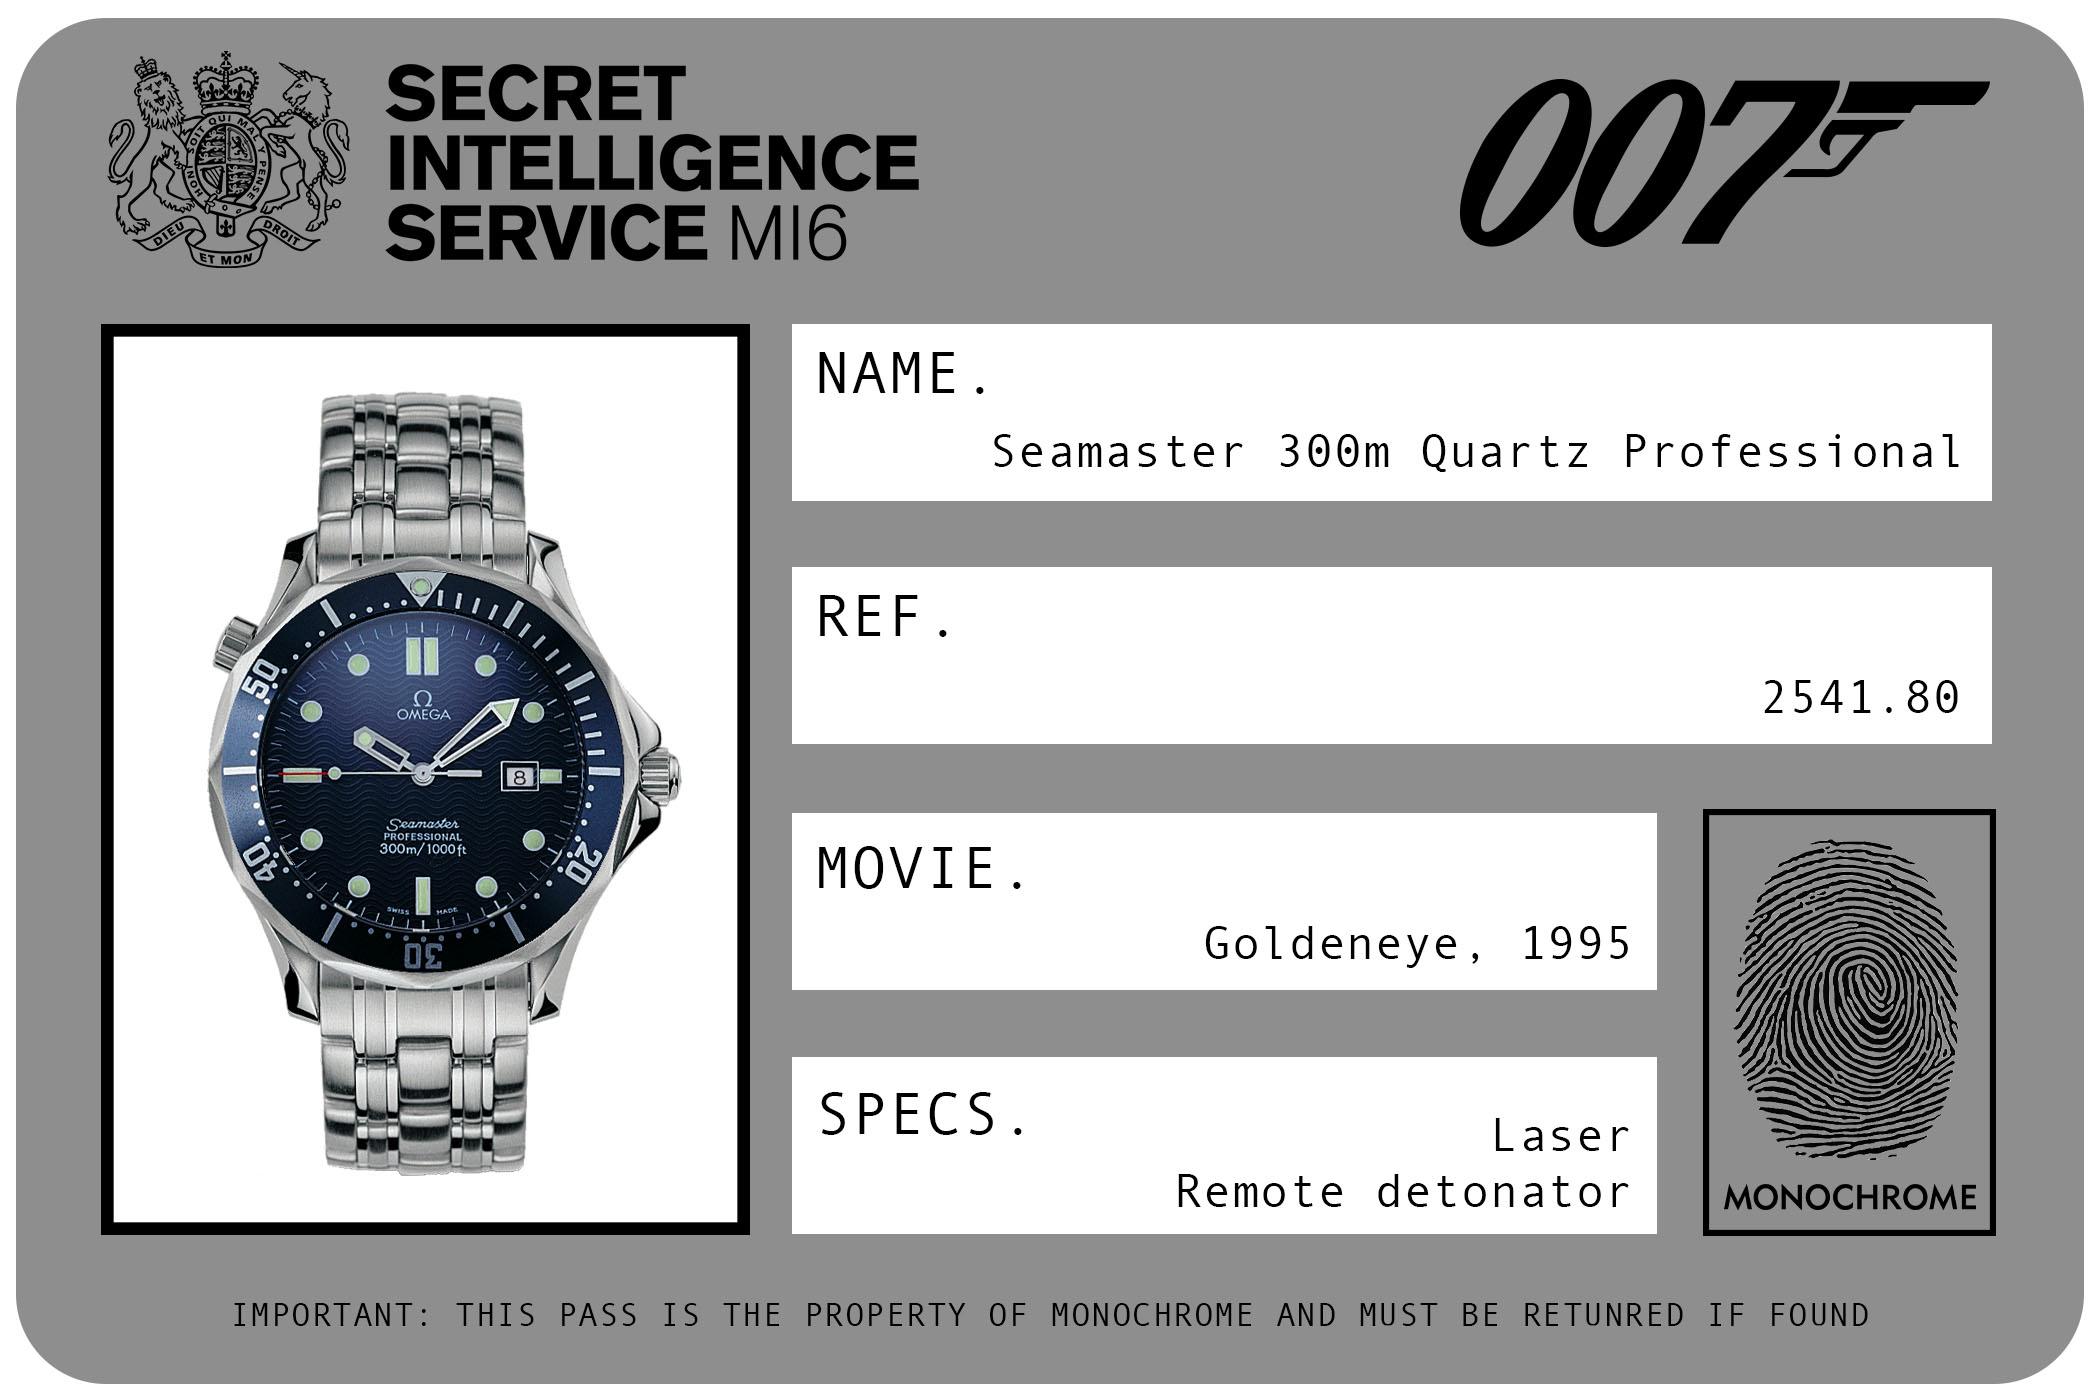 1995 - Omega Seamaster 300m Quartz Professional 2541.80 James Bond Goldeneye ID Card